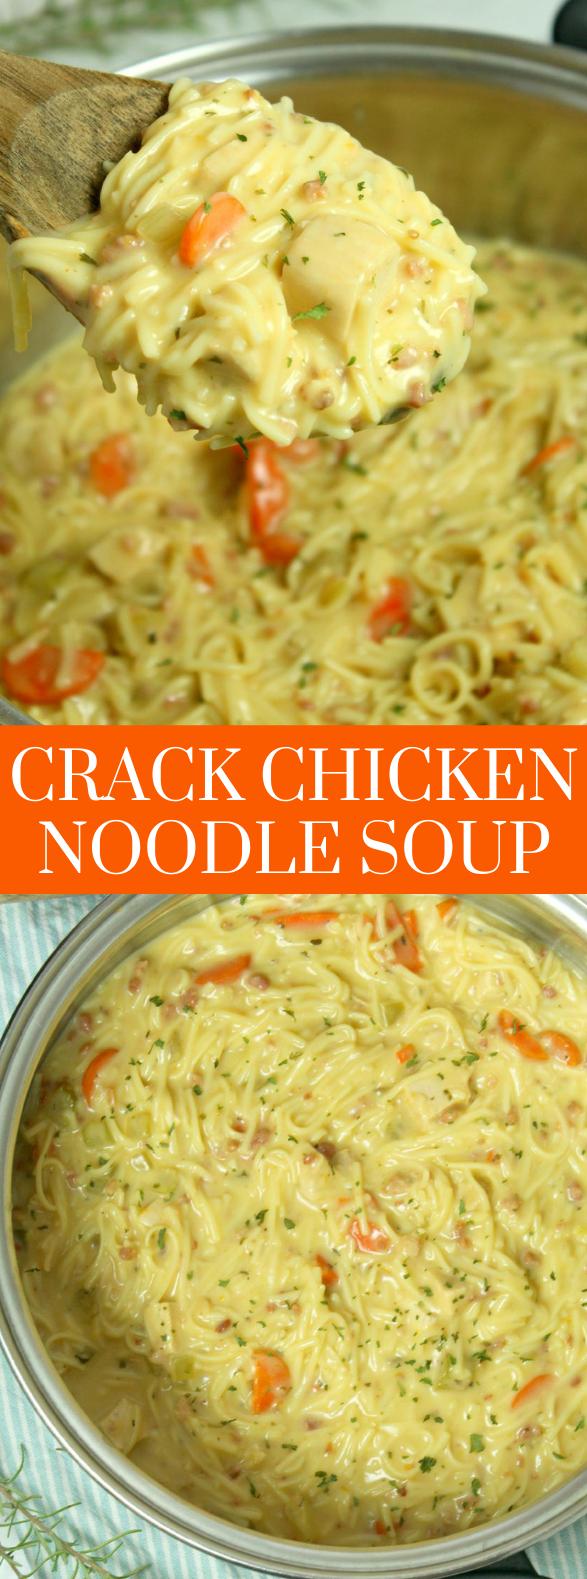 Crack Chicken Noodle Soup #dinner #recipes #dinnerrecipes Crack Chicken Noodle S...